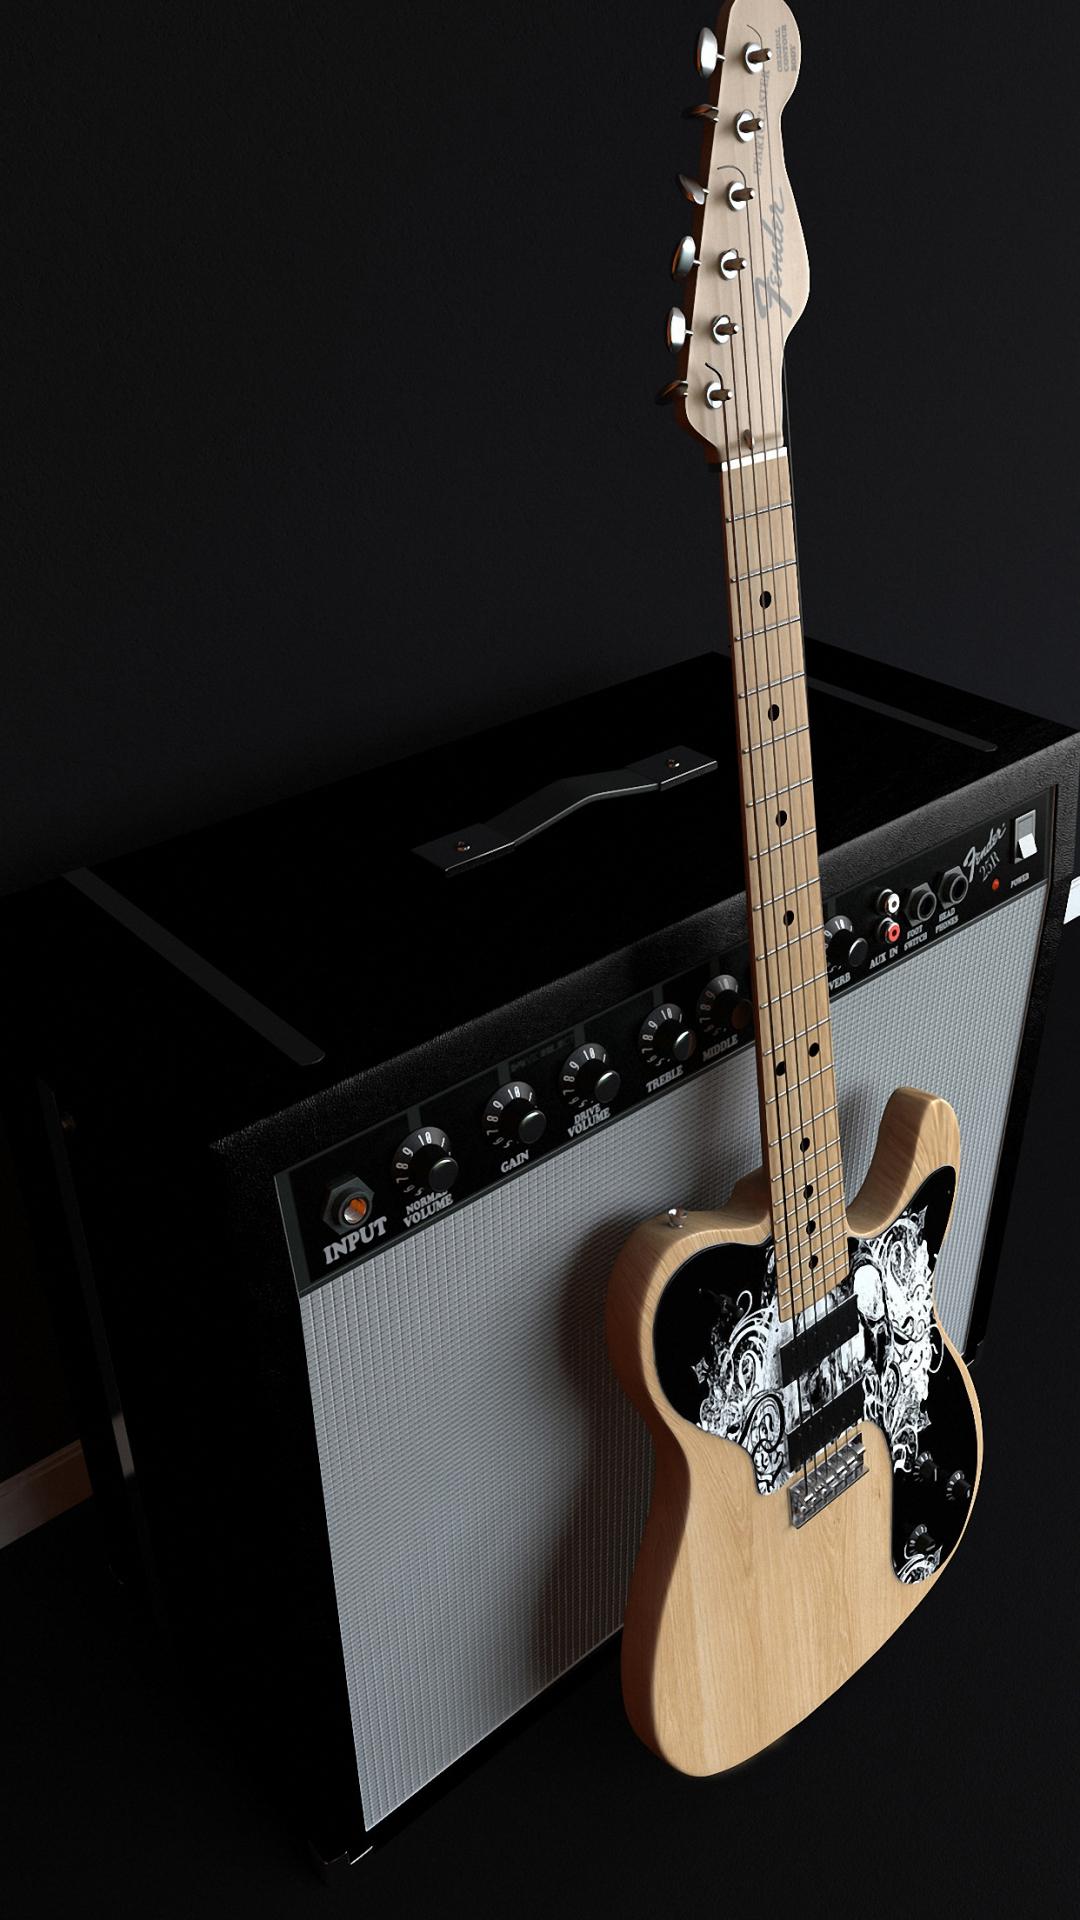 1080x1920 Fender Music Guitar iphone 6s plus Wallpaper HD 1080x1920